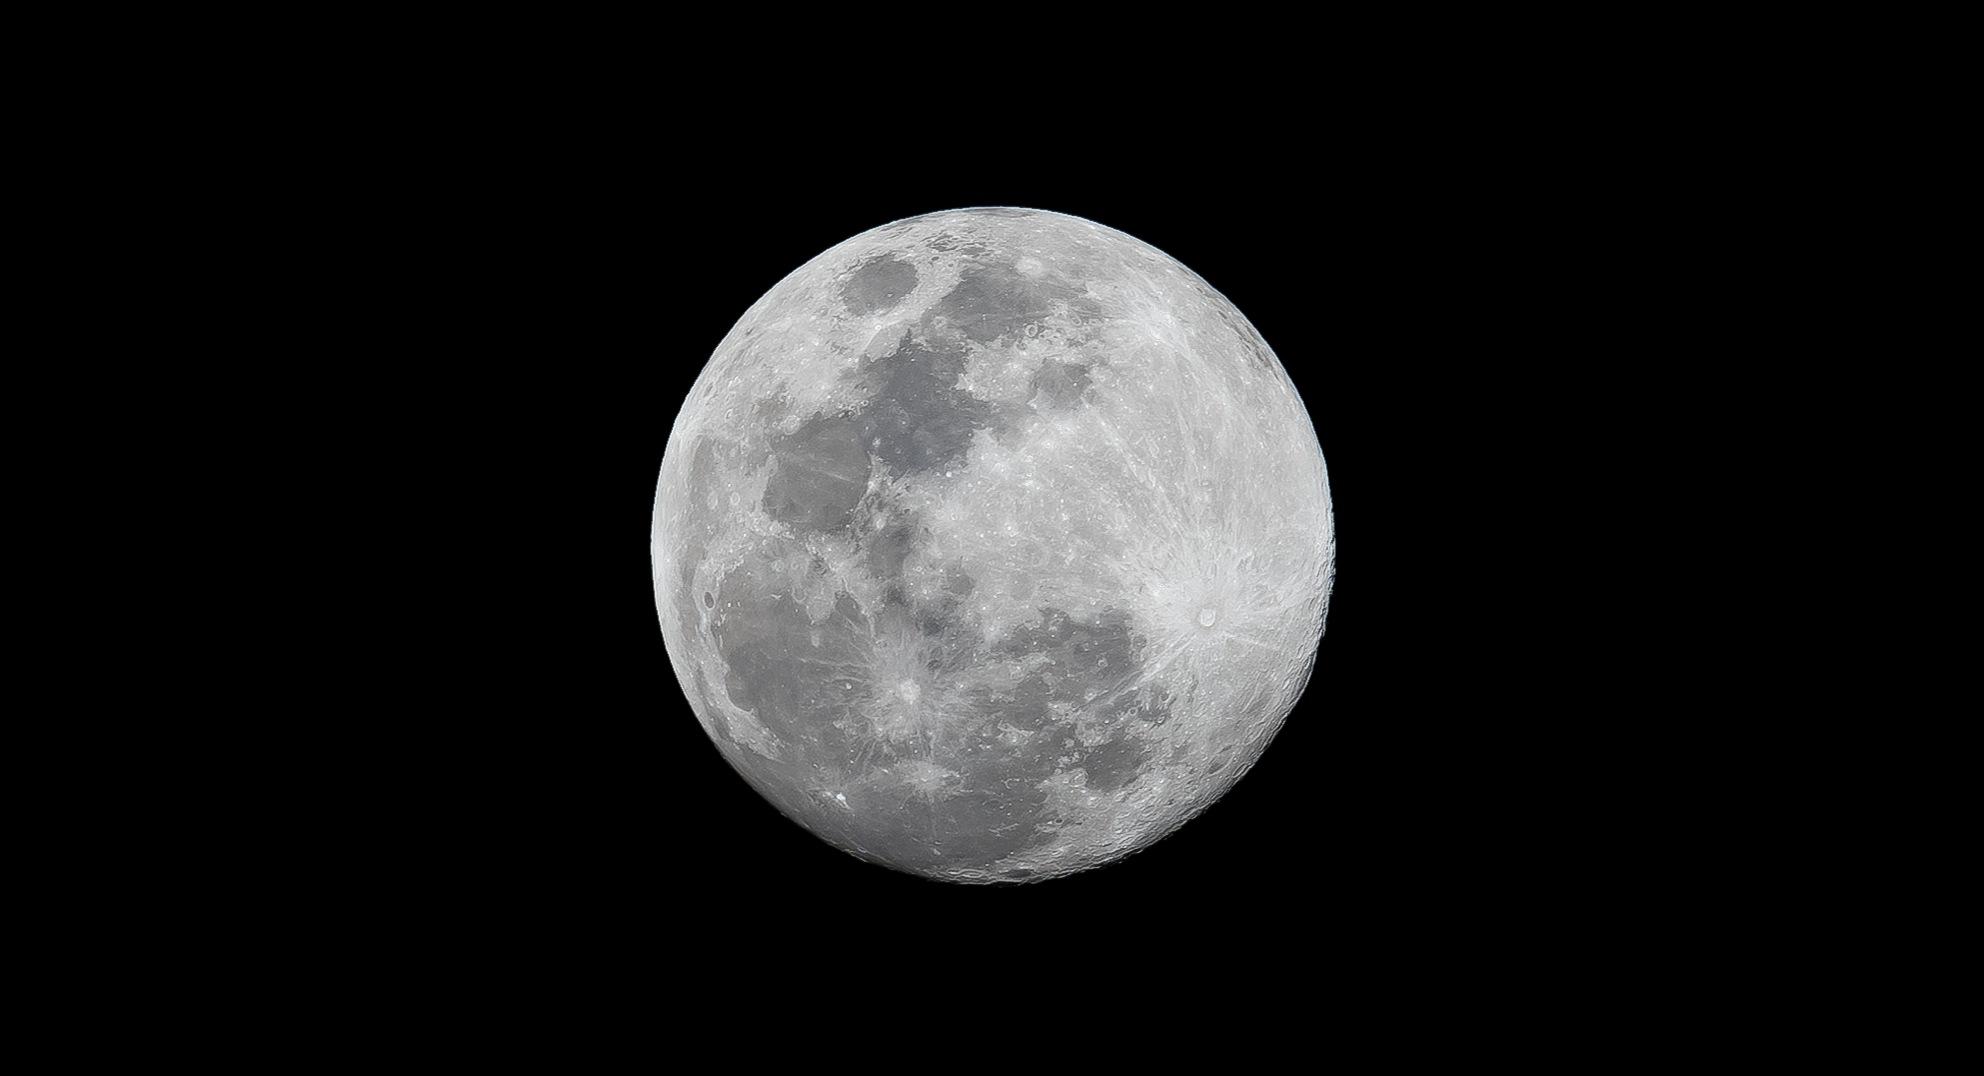 Full Moon by Mahmoud Shokry